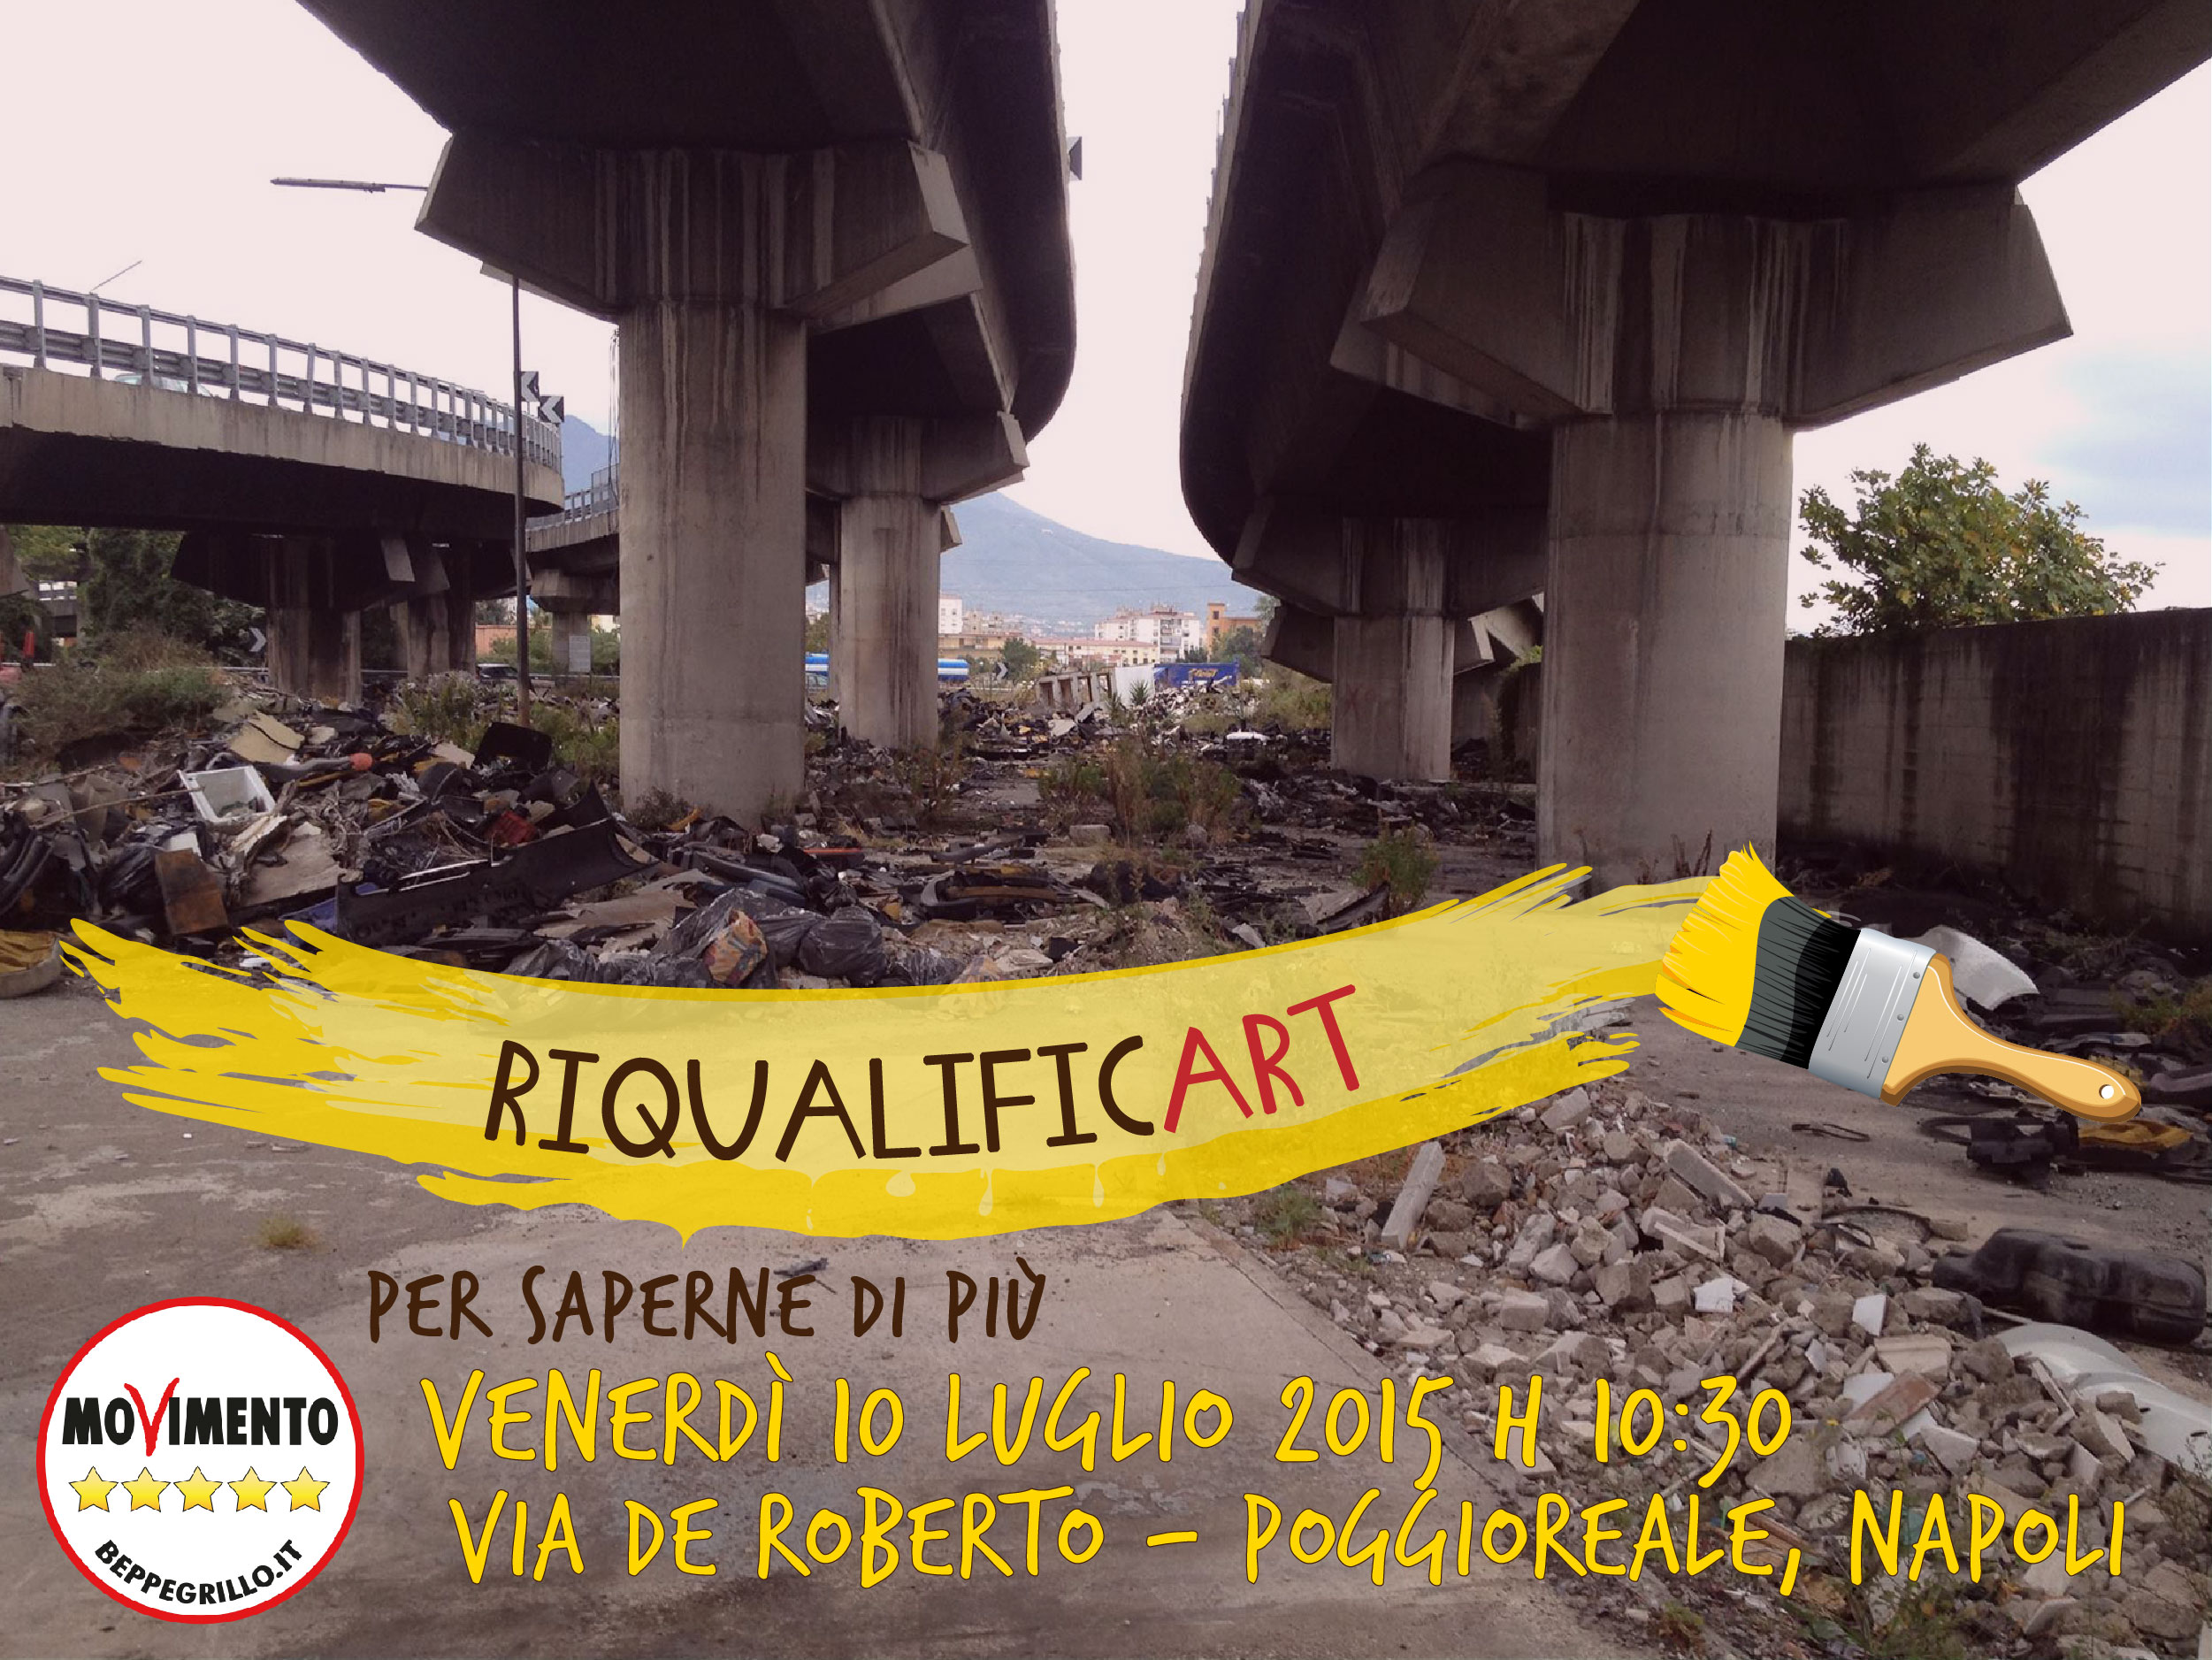 discarica_via-de-roberto_edt